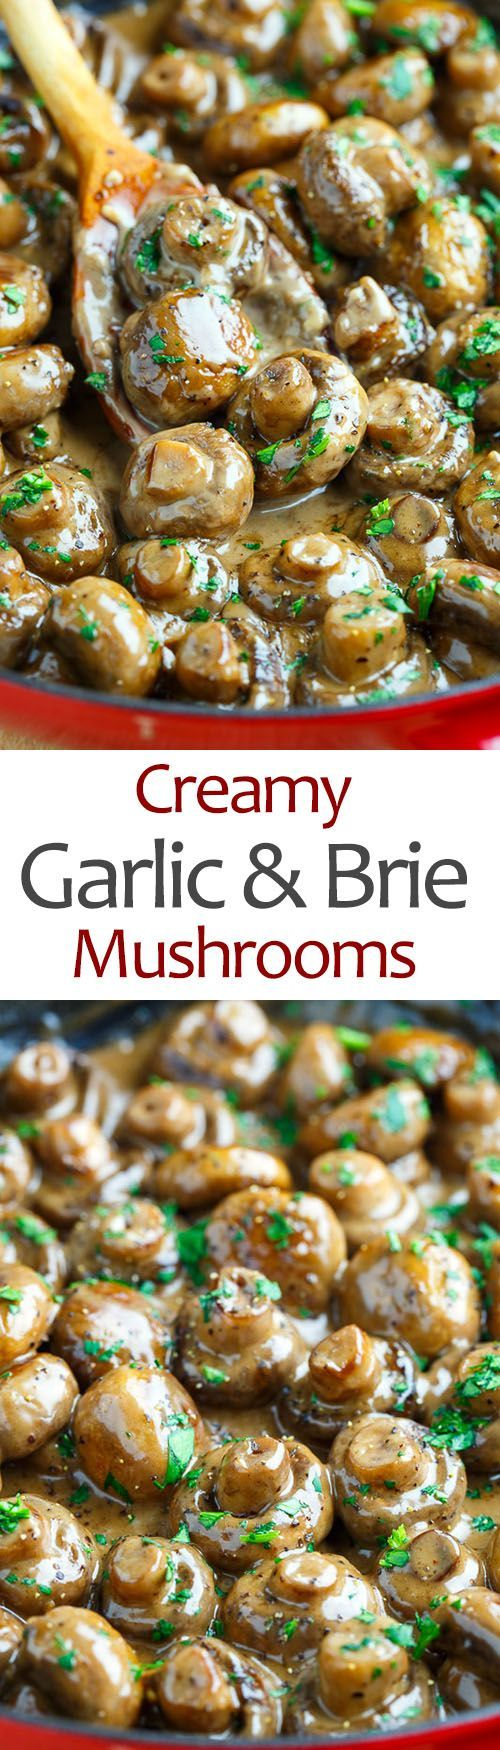 Creamy Garlic and Brie Mushrooms #spon @mushroomscanada